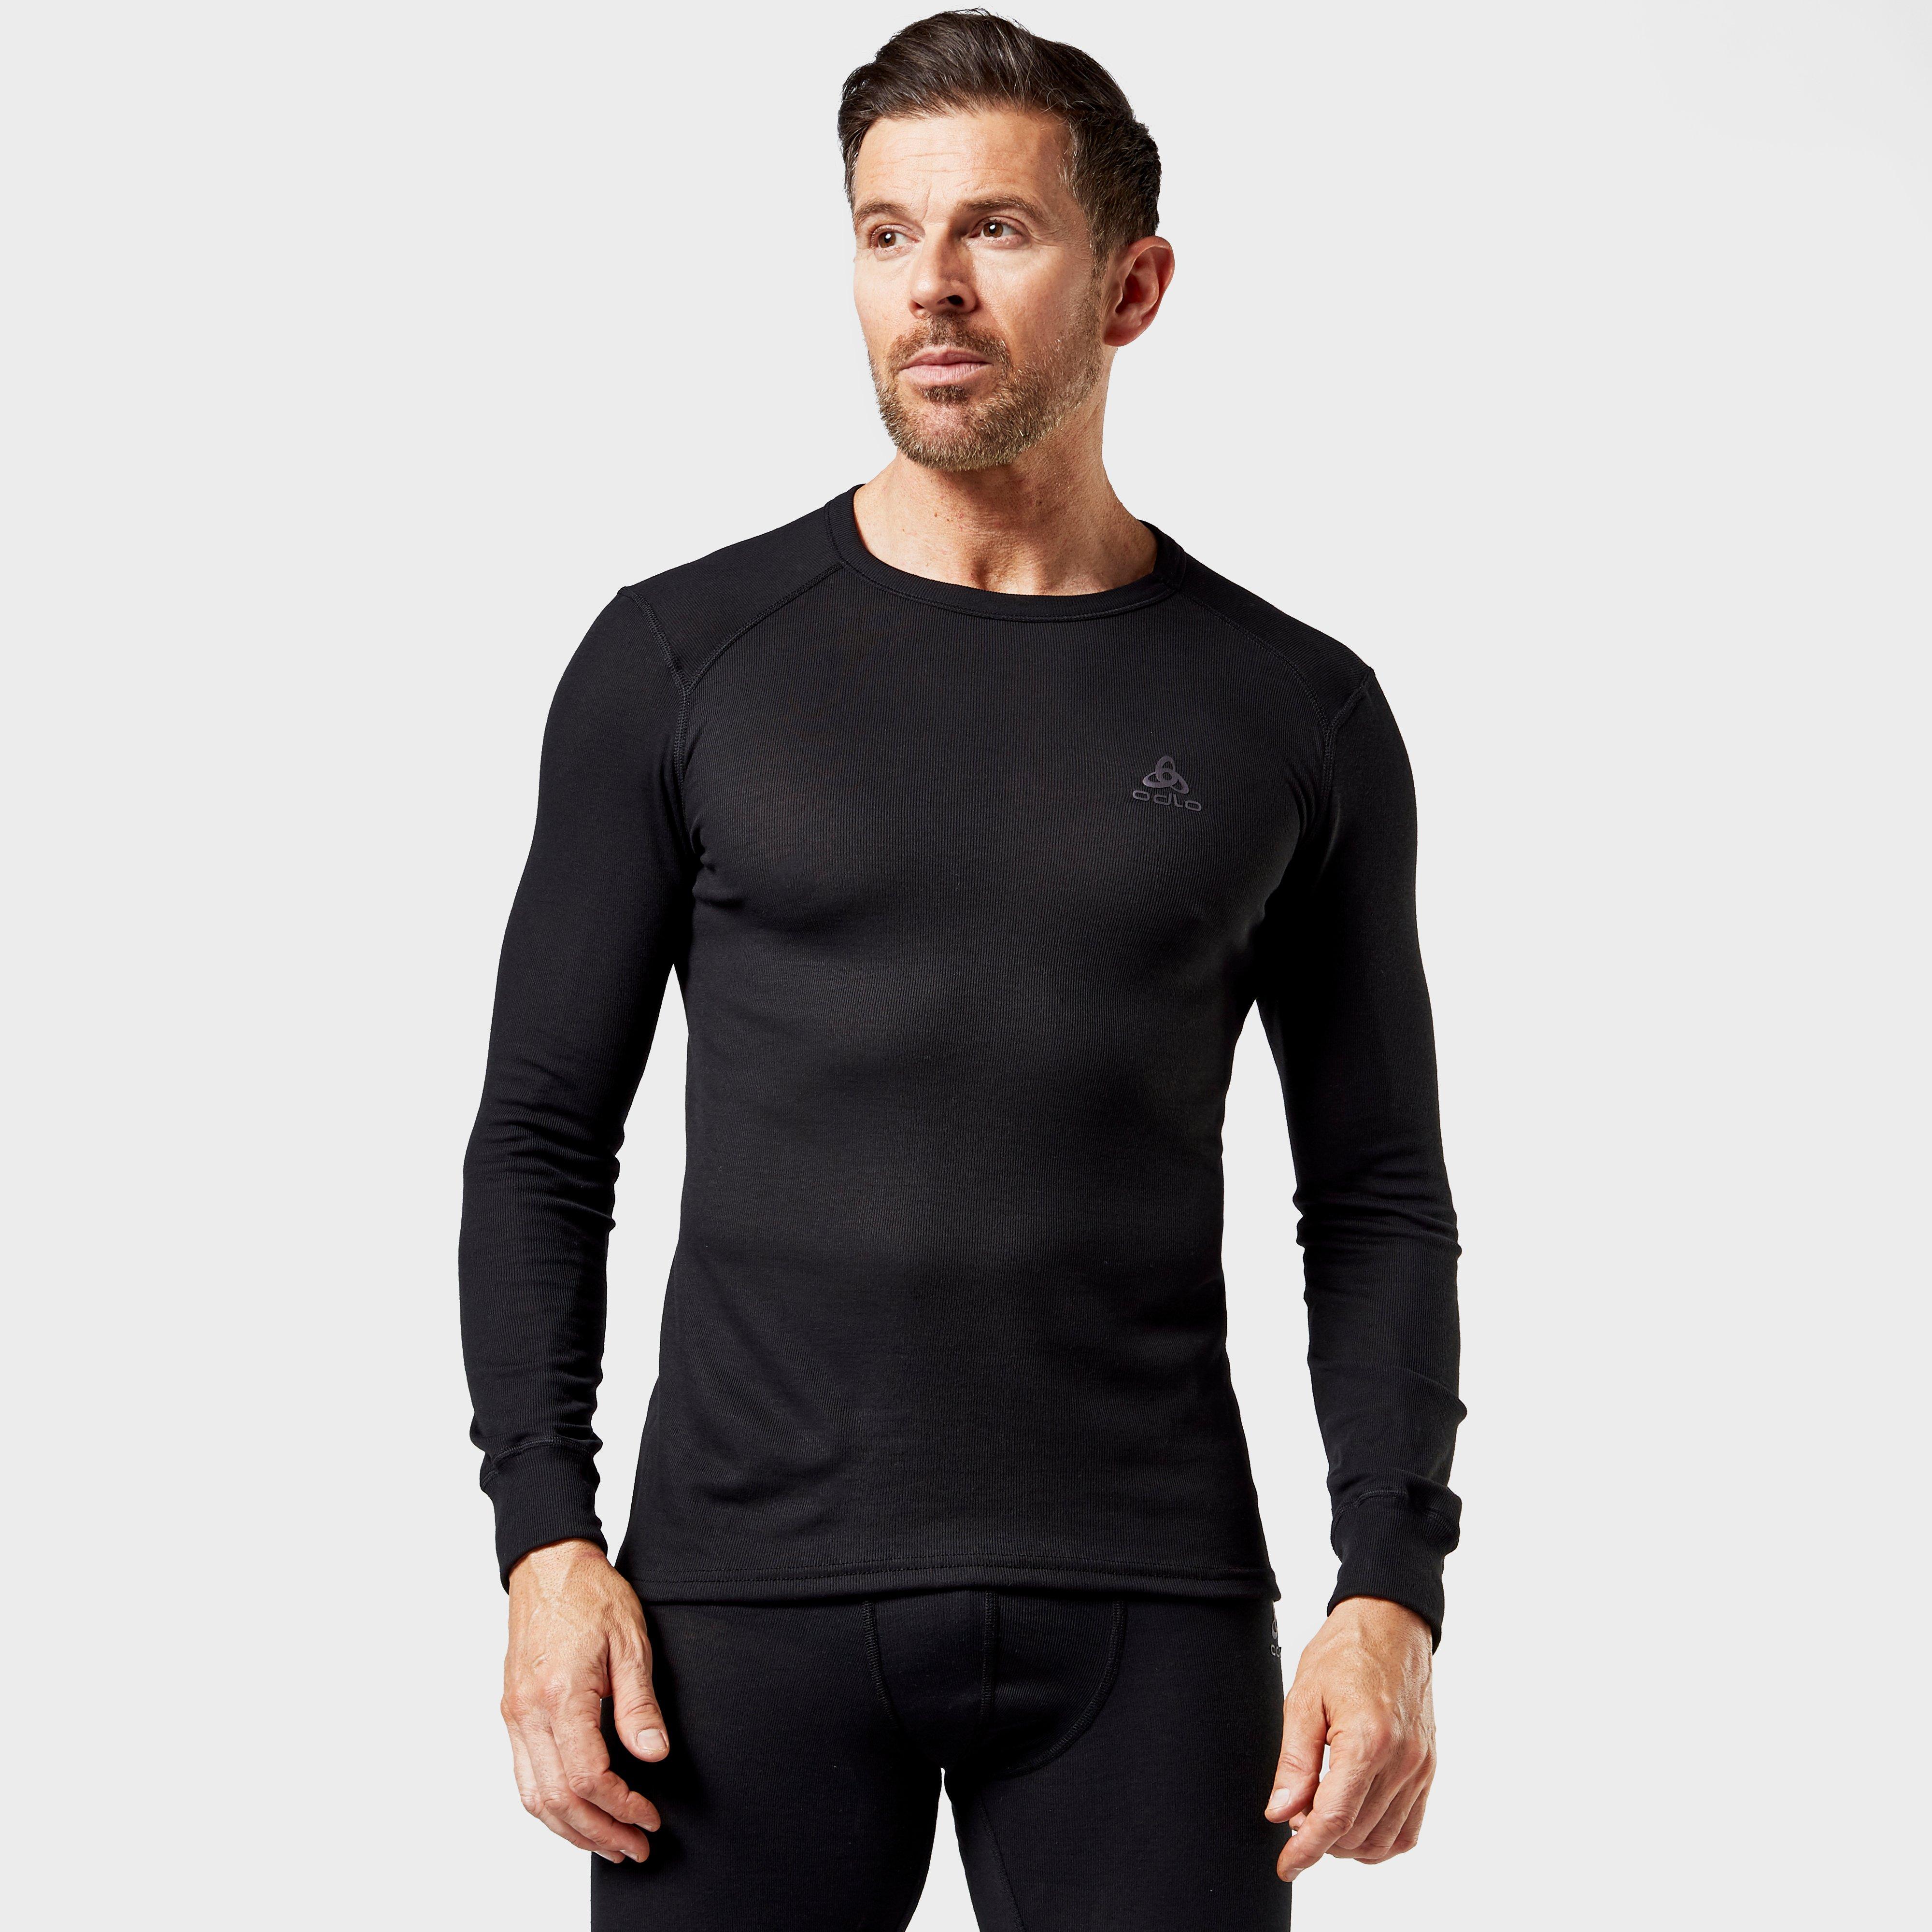 Odlo Odlo Mens Active Long Sleeve Crew Shirt - Black, Black